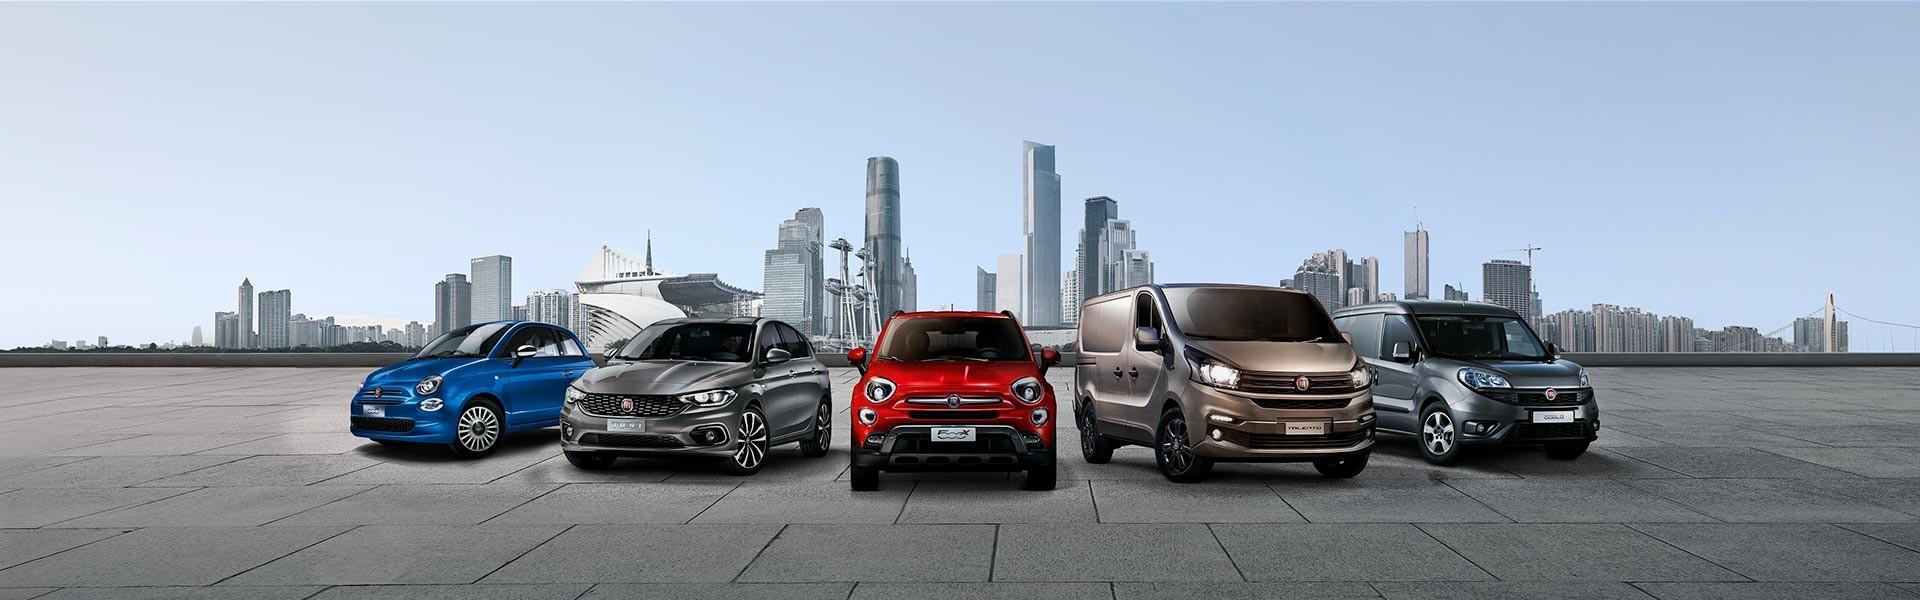 Autoland Pocking | Fiat - Jeep - Abarth - Fiat Professional  Neuwagen